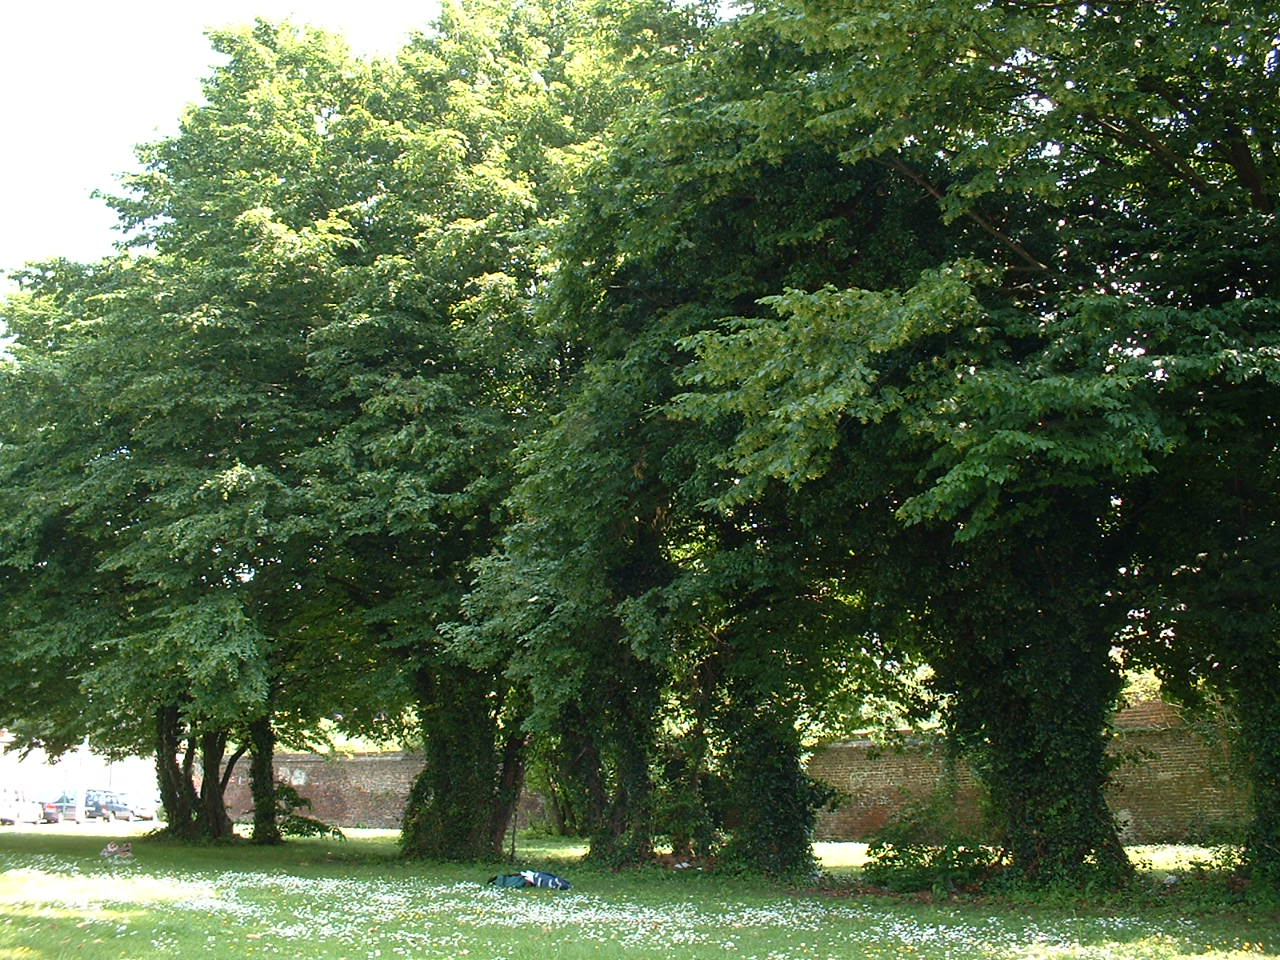 carpinus betulus arbre charme commun image. Black Bedroom Furniture Sets. Home Design Ideas